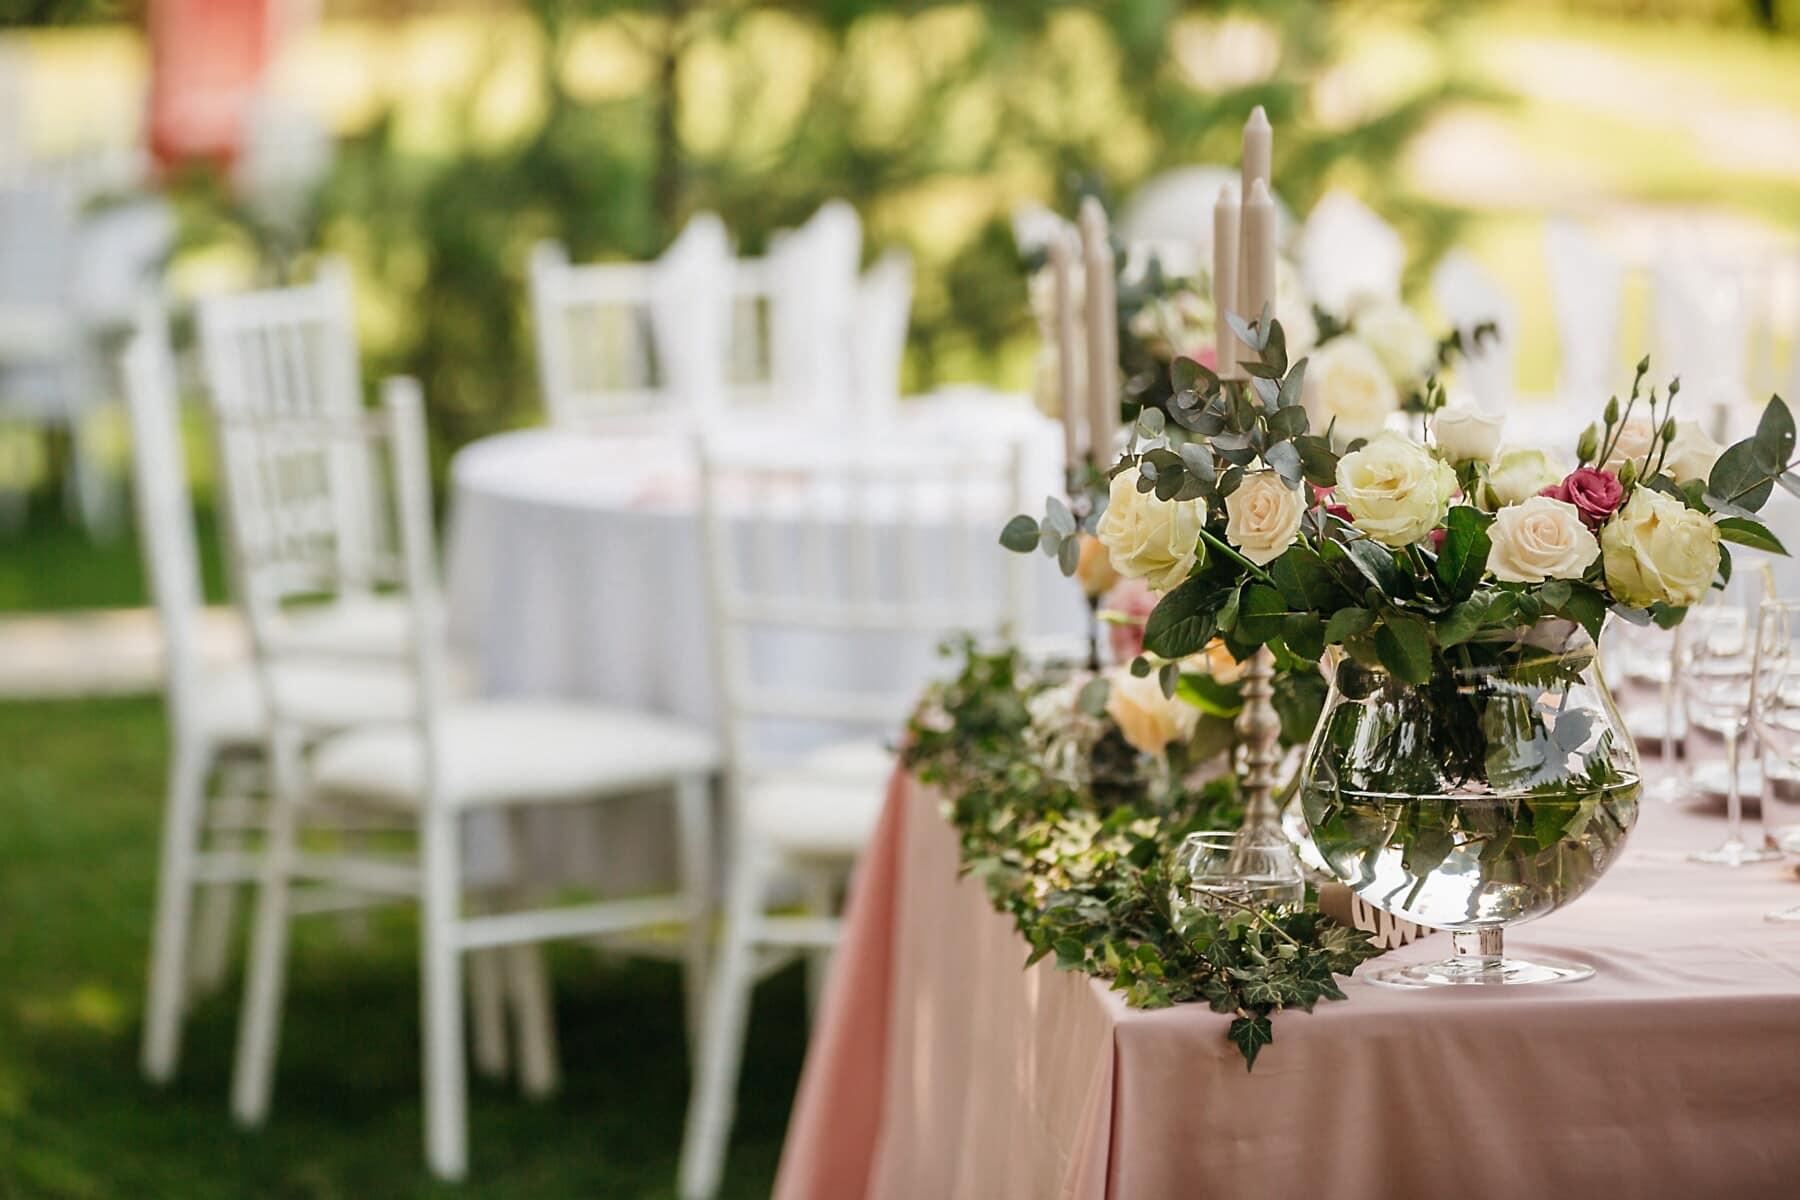 wedding venue, reception, banquet, garden, backyard, flowers, wedding, bouquet, flower, table